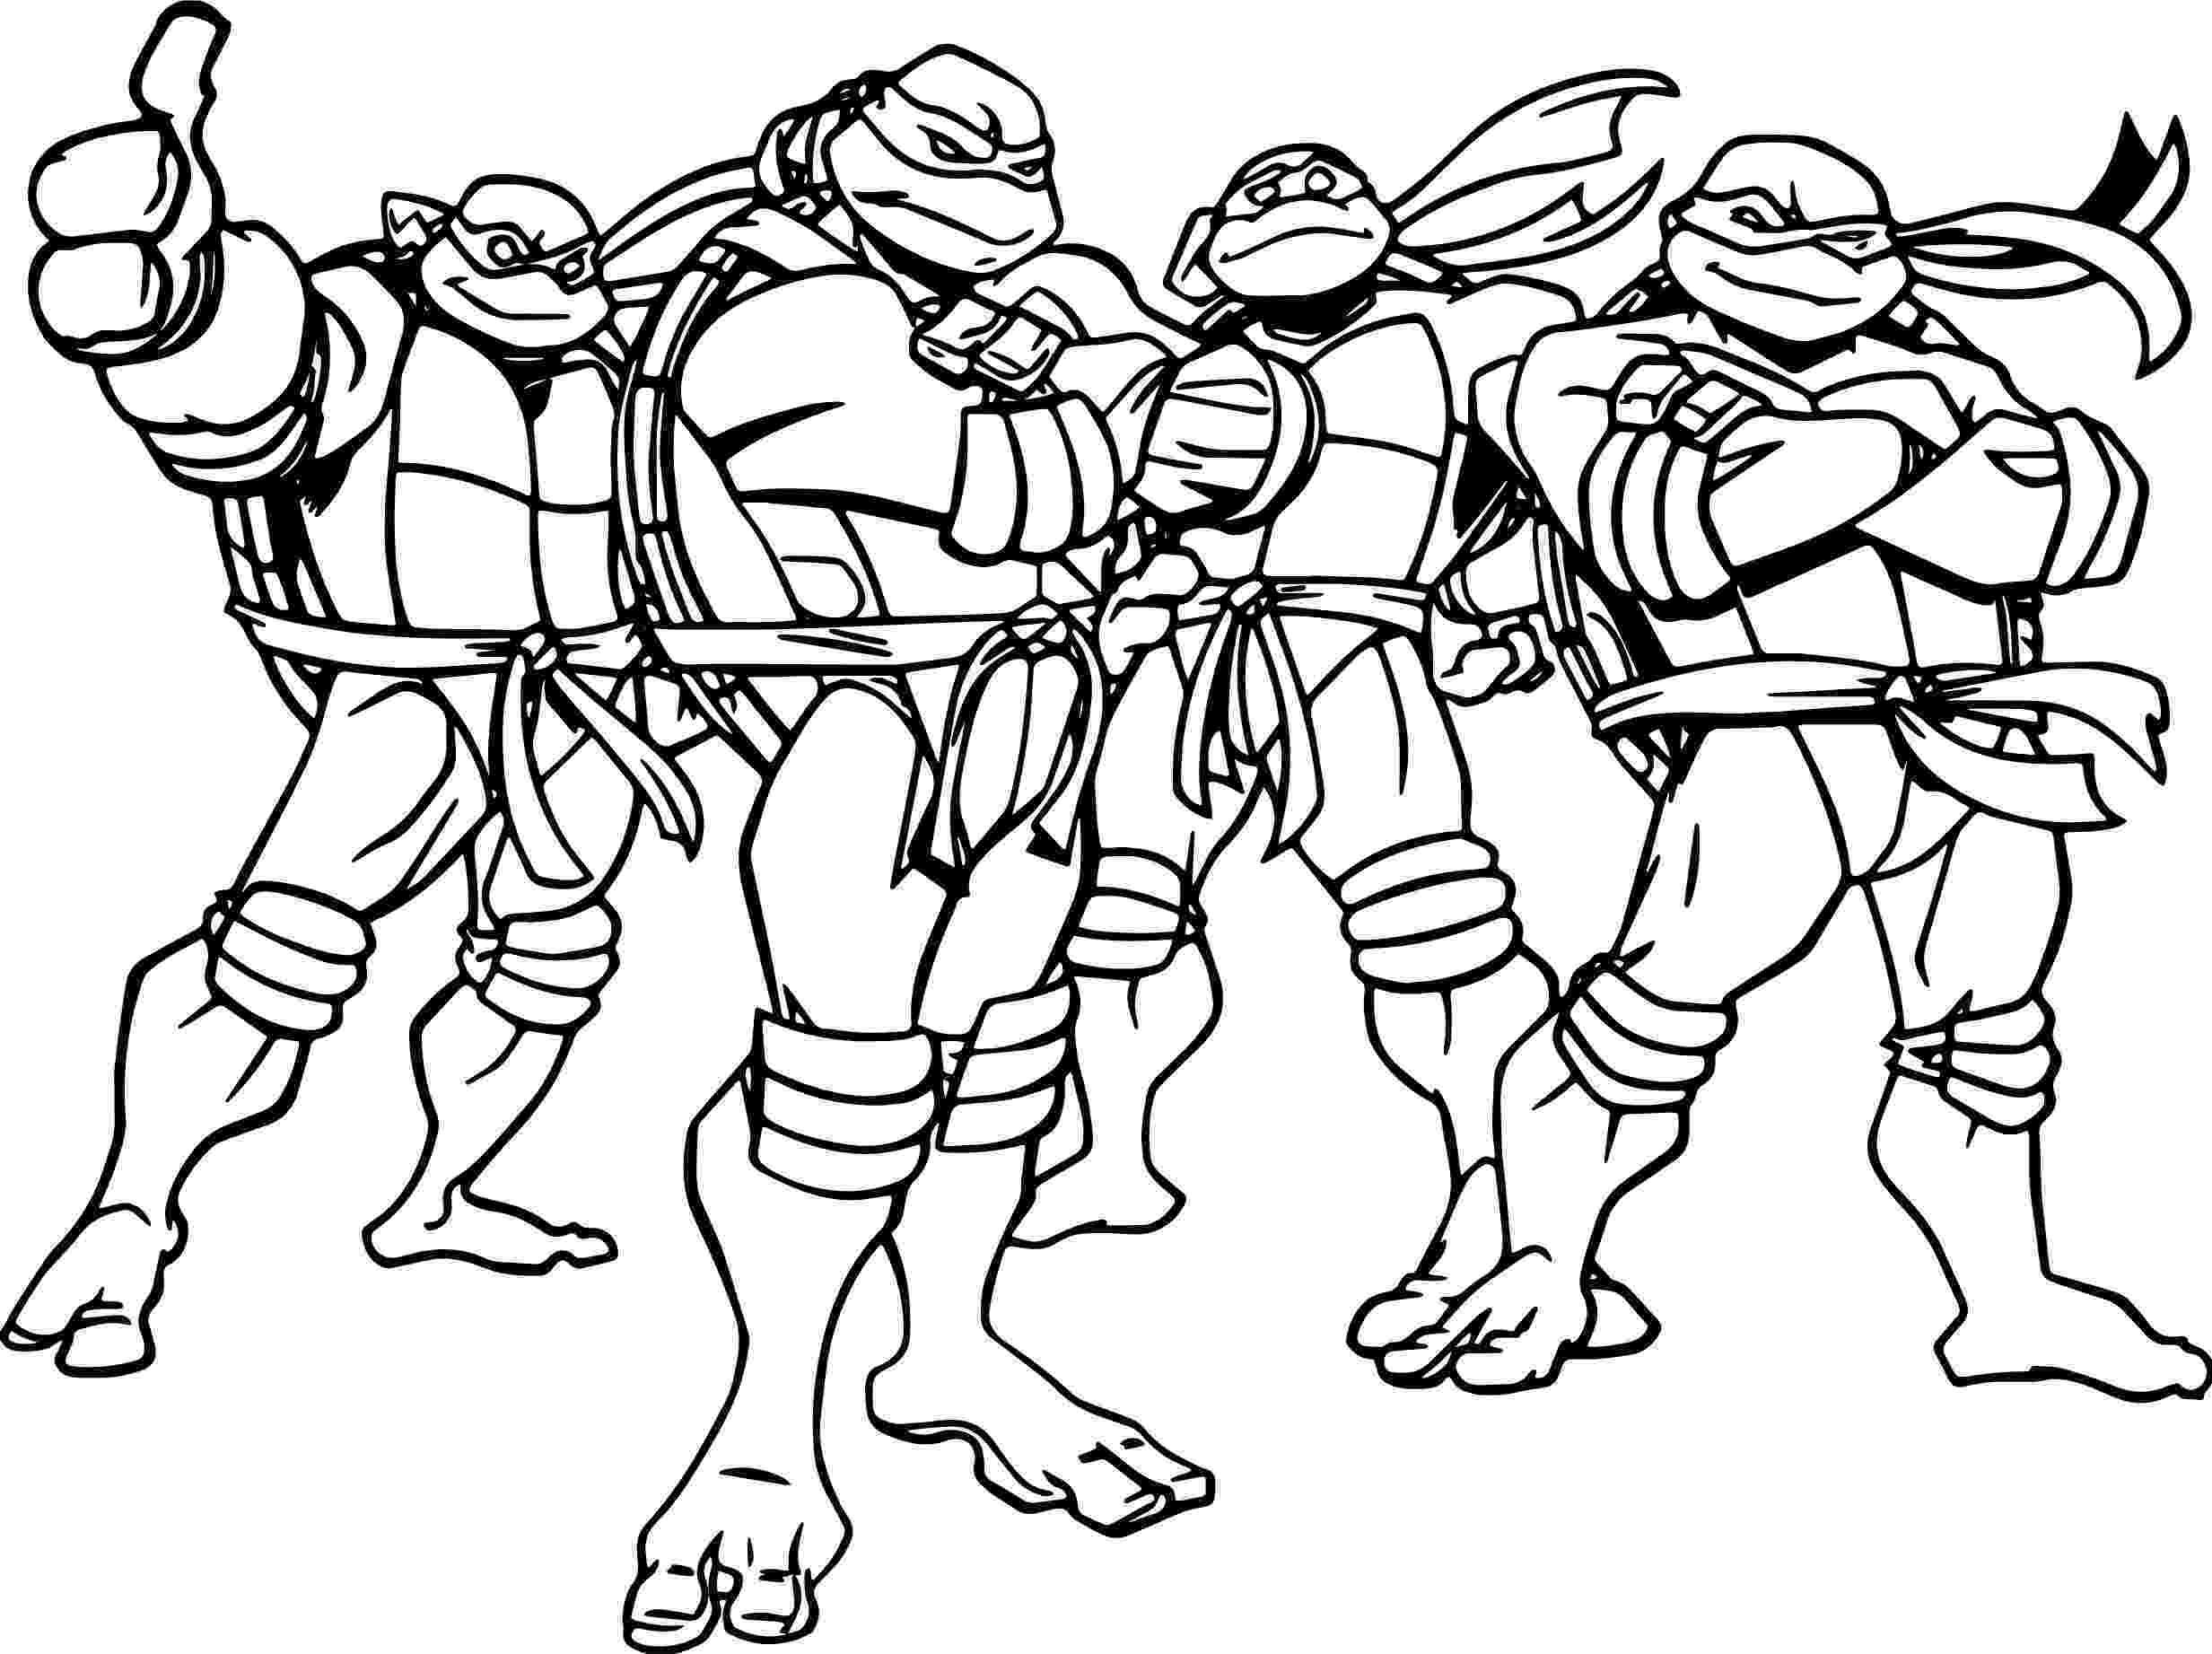 ninja turtle colouring pictures ninja turtles cartoon coloring page wecoloringpagecom turtle colouring ninja pictures